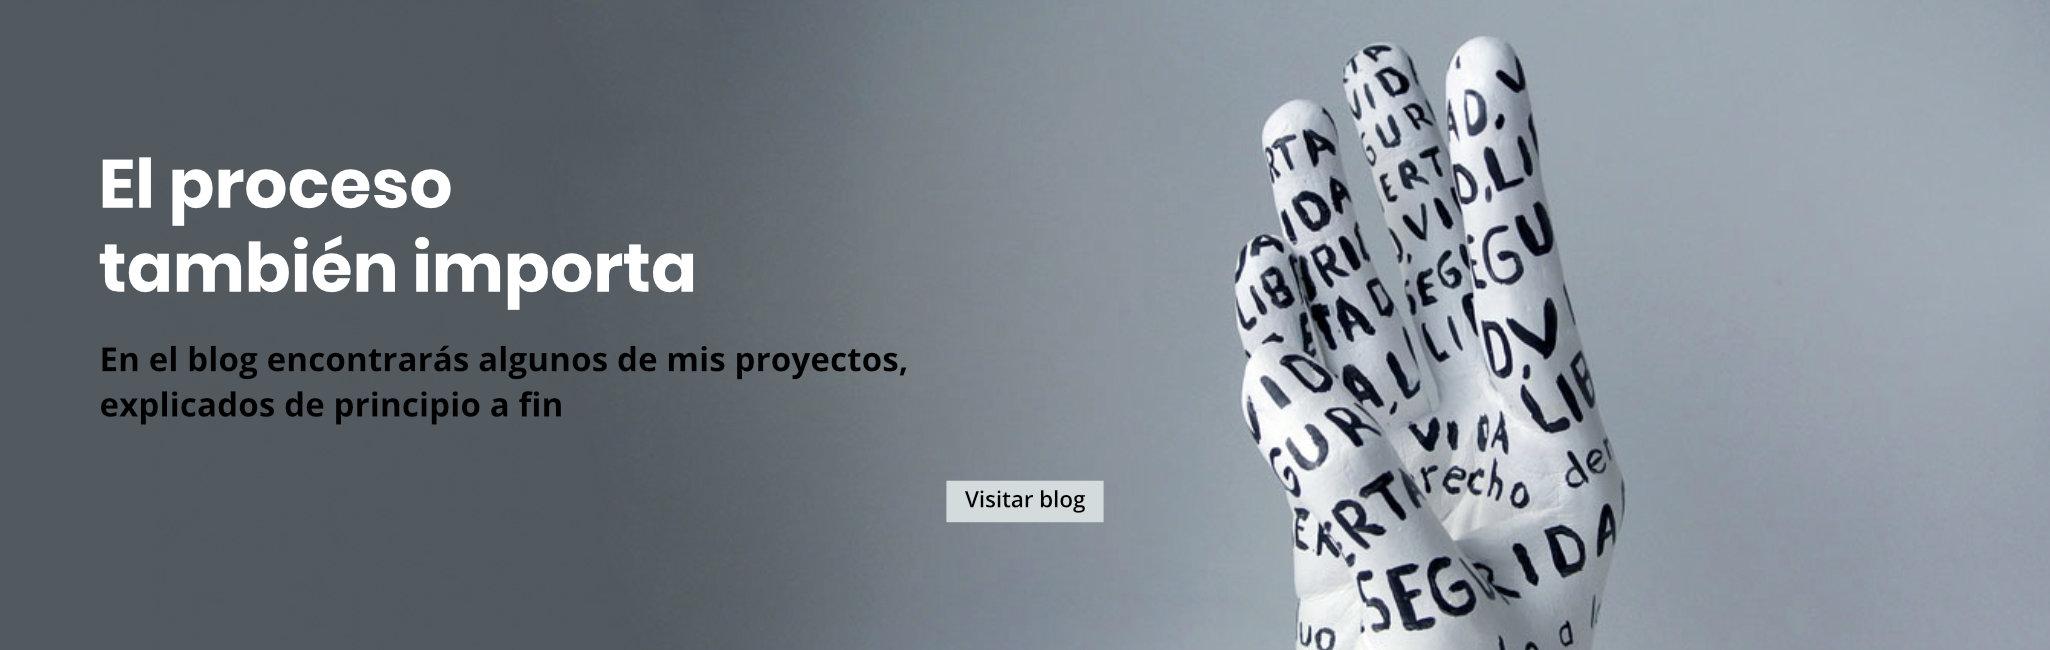 Banner para slider de inicio blog